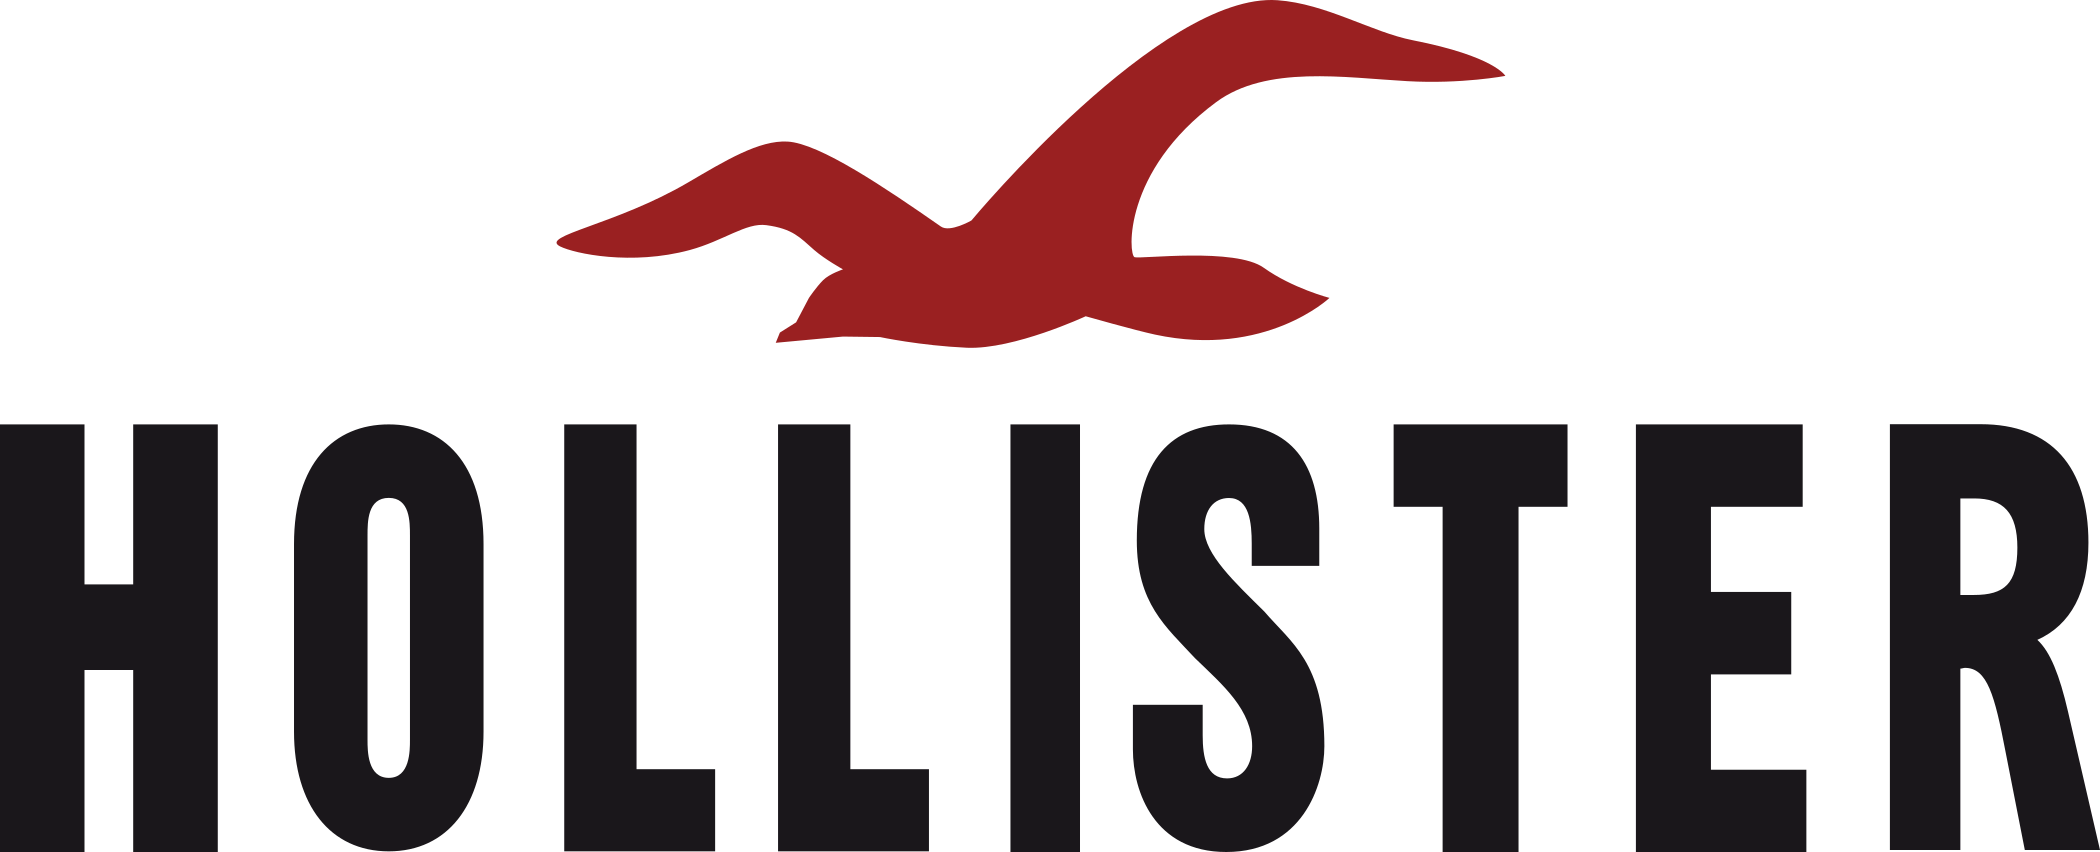 hollister-logo-3